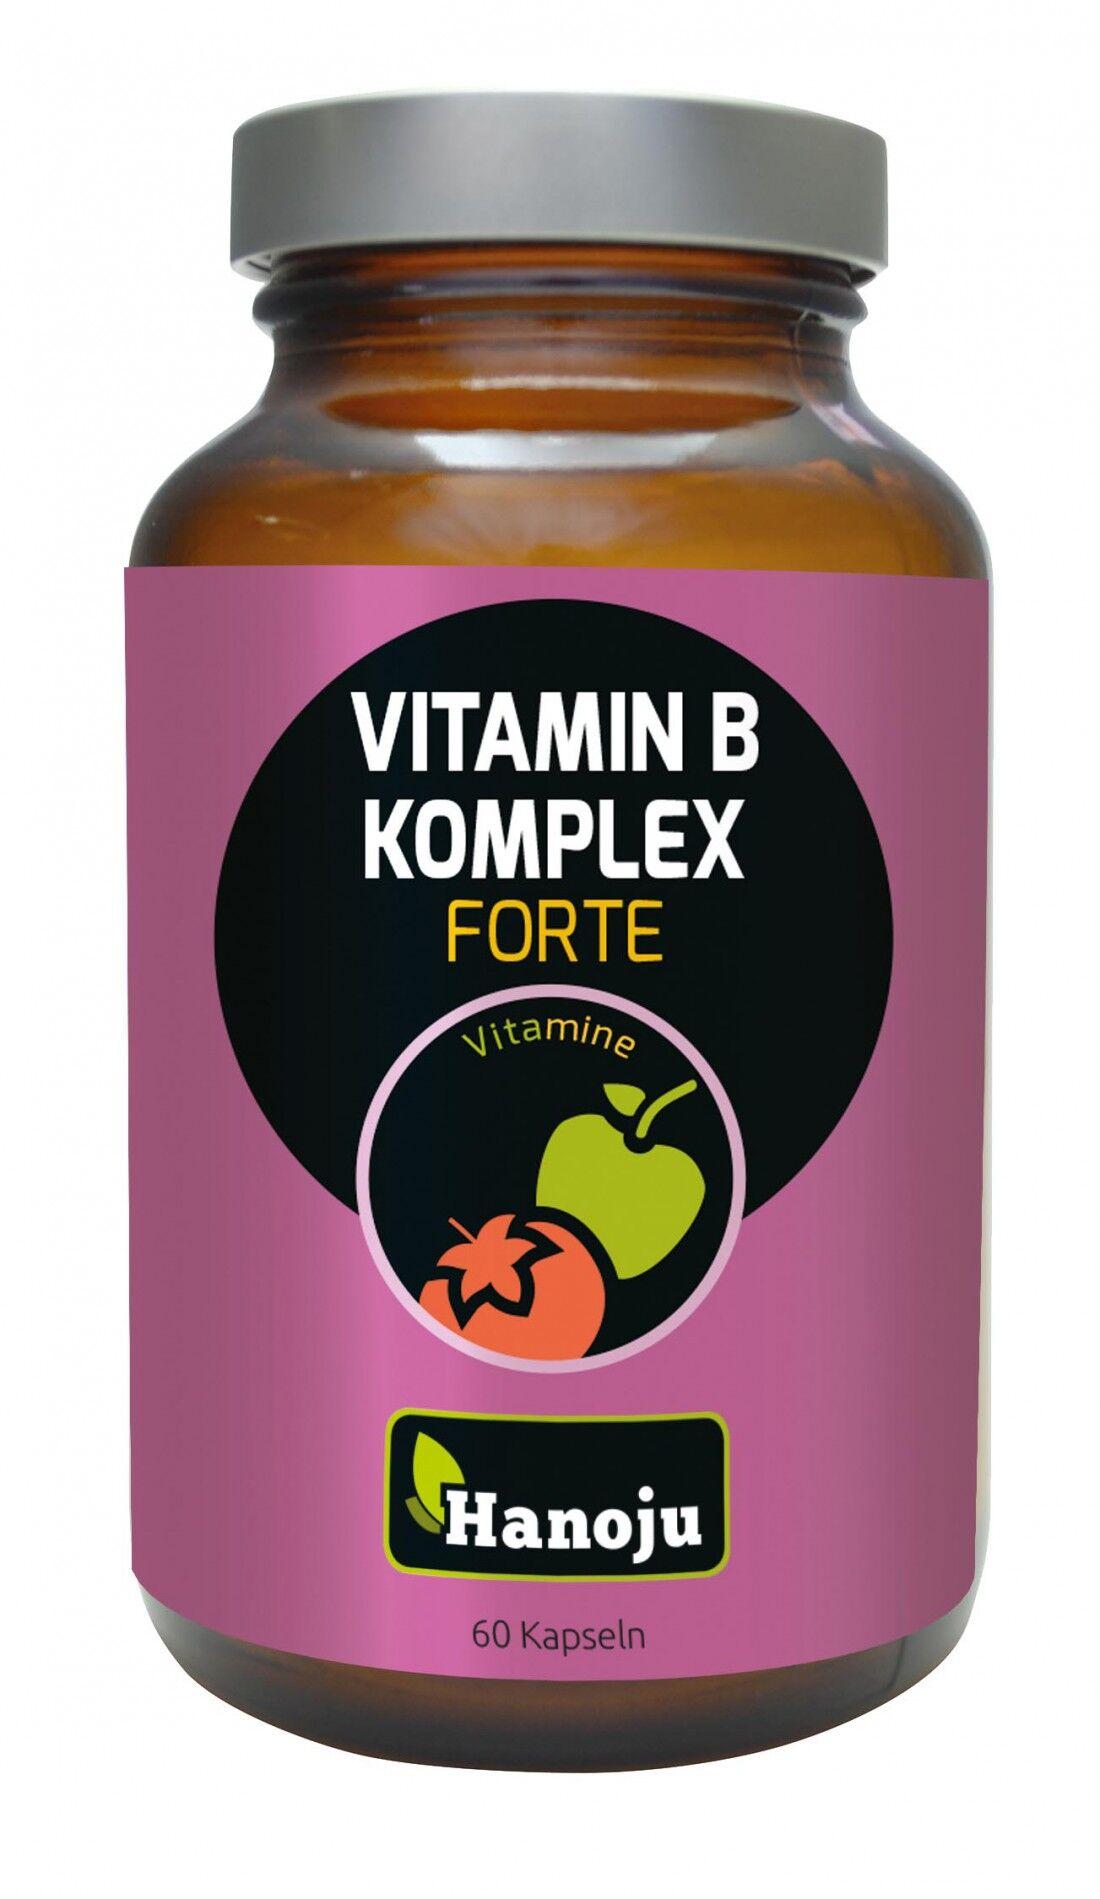 Hanoju Complexe de vitamine B - 60 gélules de 625 mg